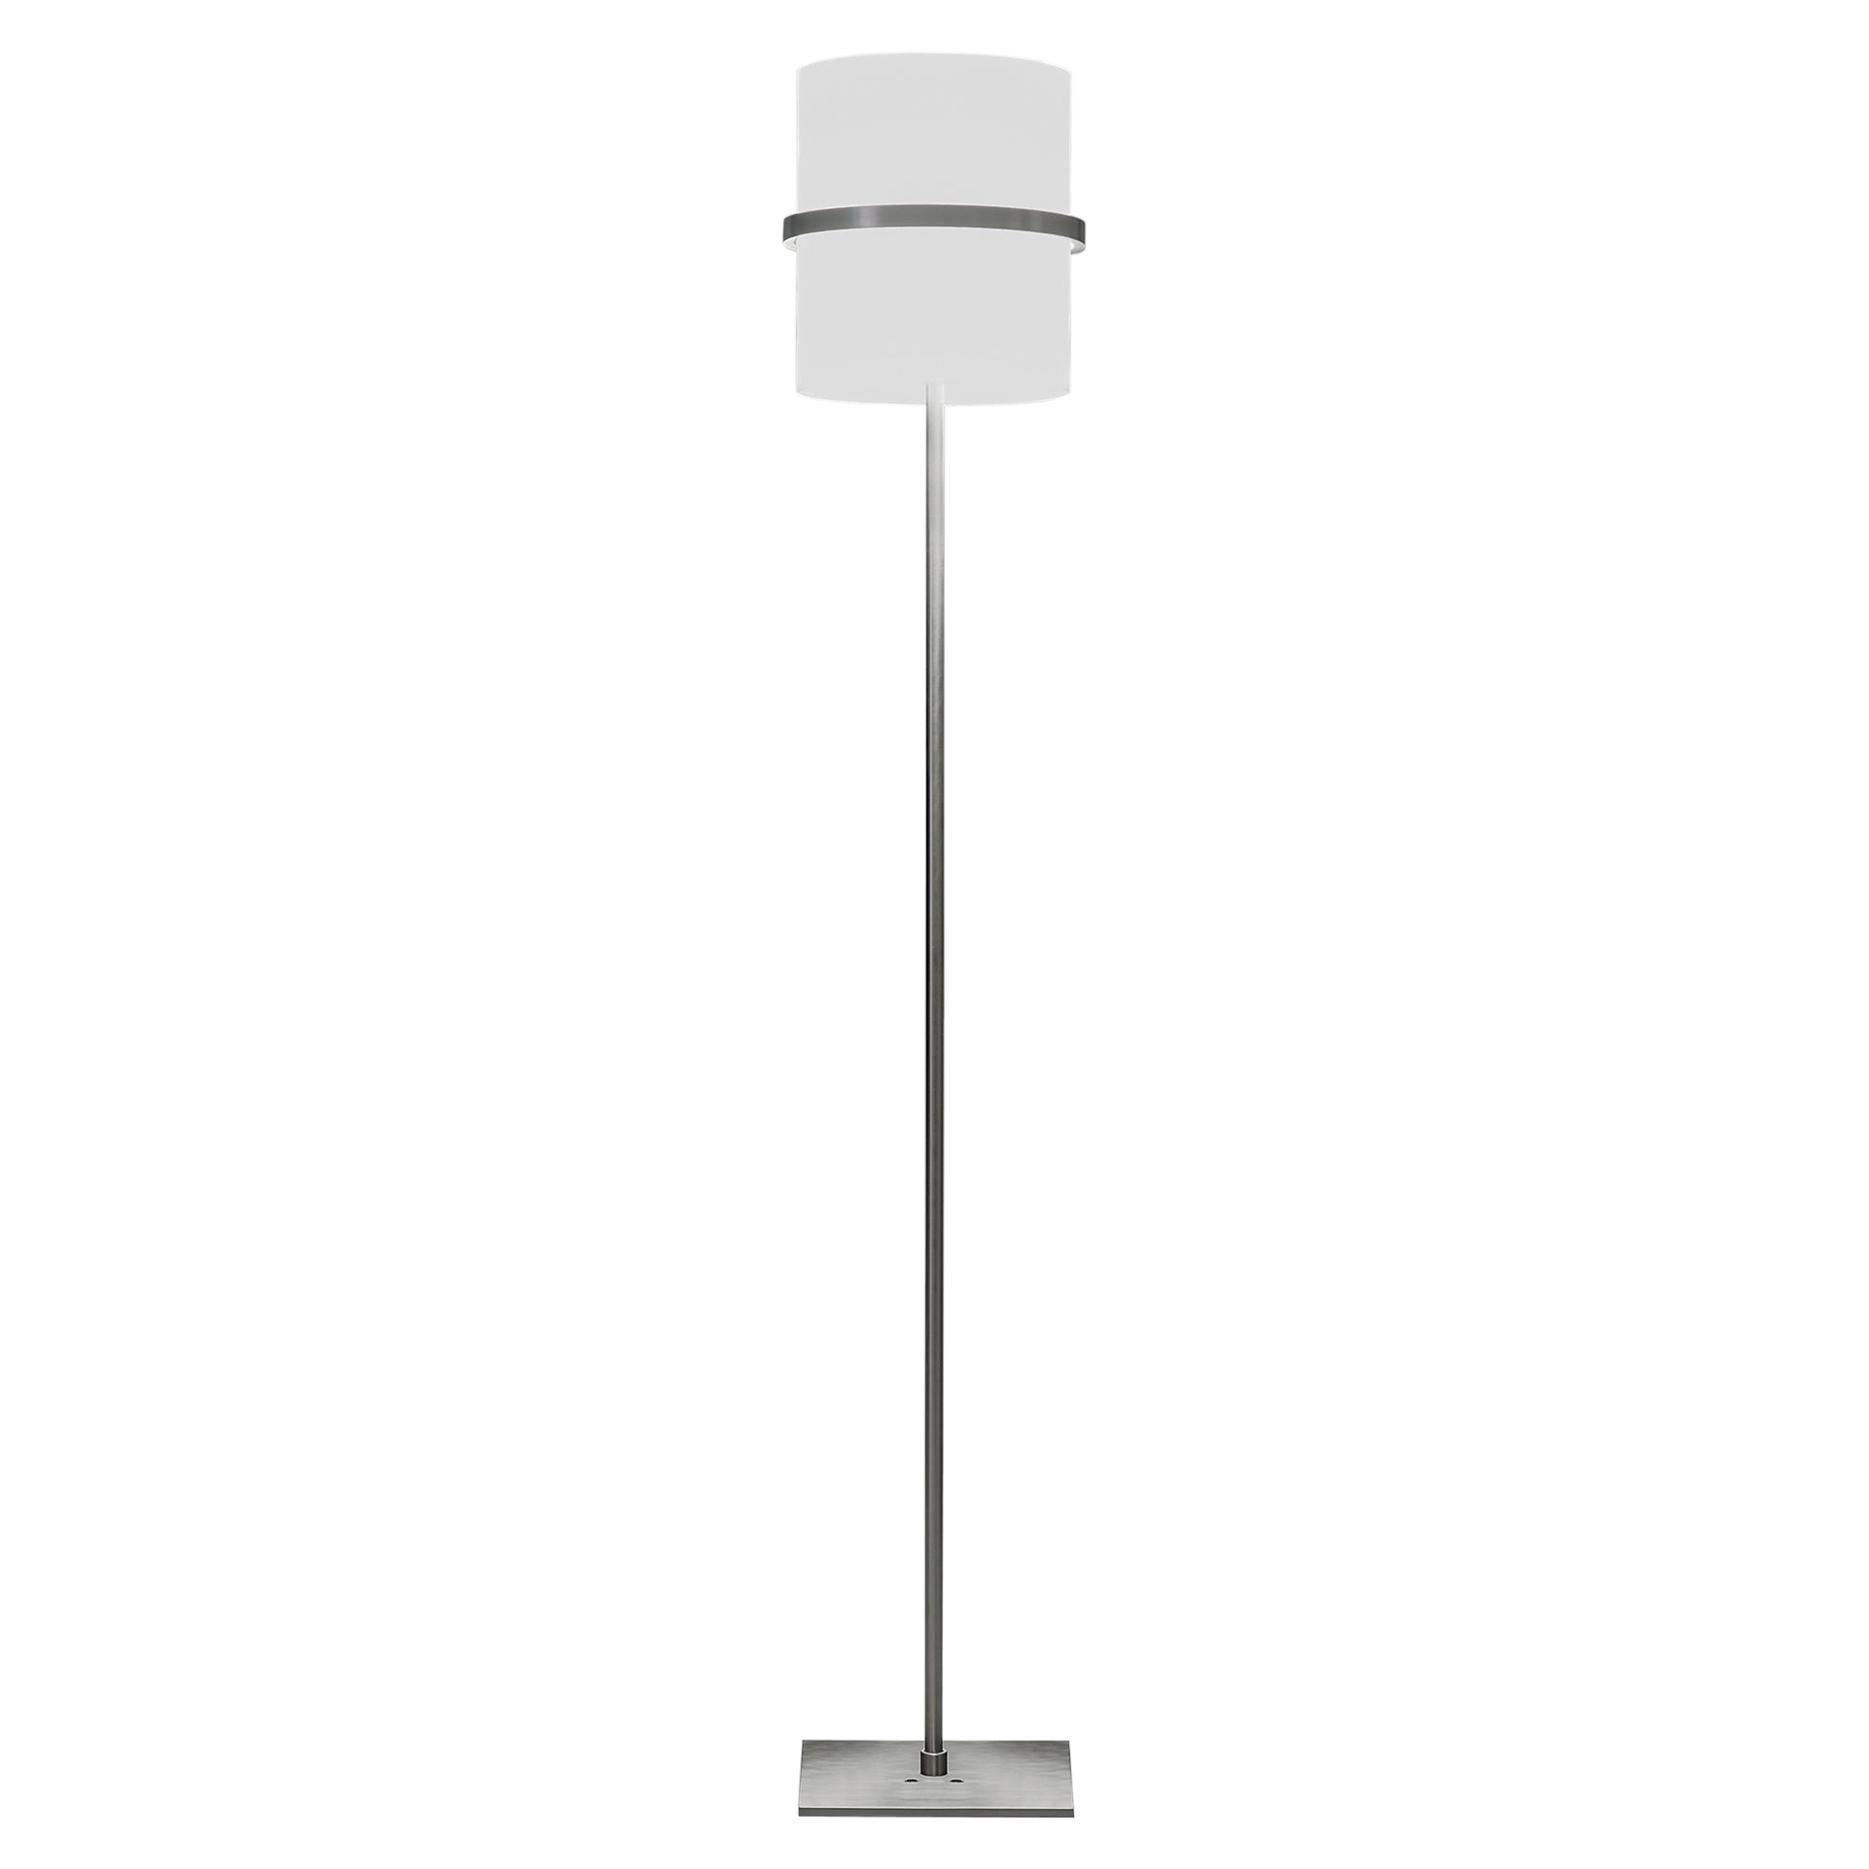 Firmamento Milano Boa Floor Lamp by Carlo Guglielmi